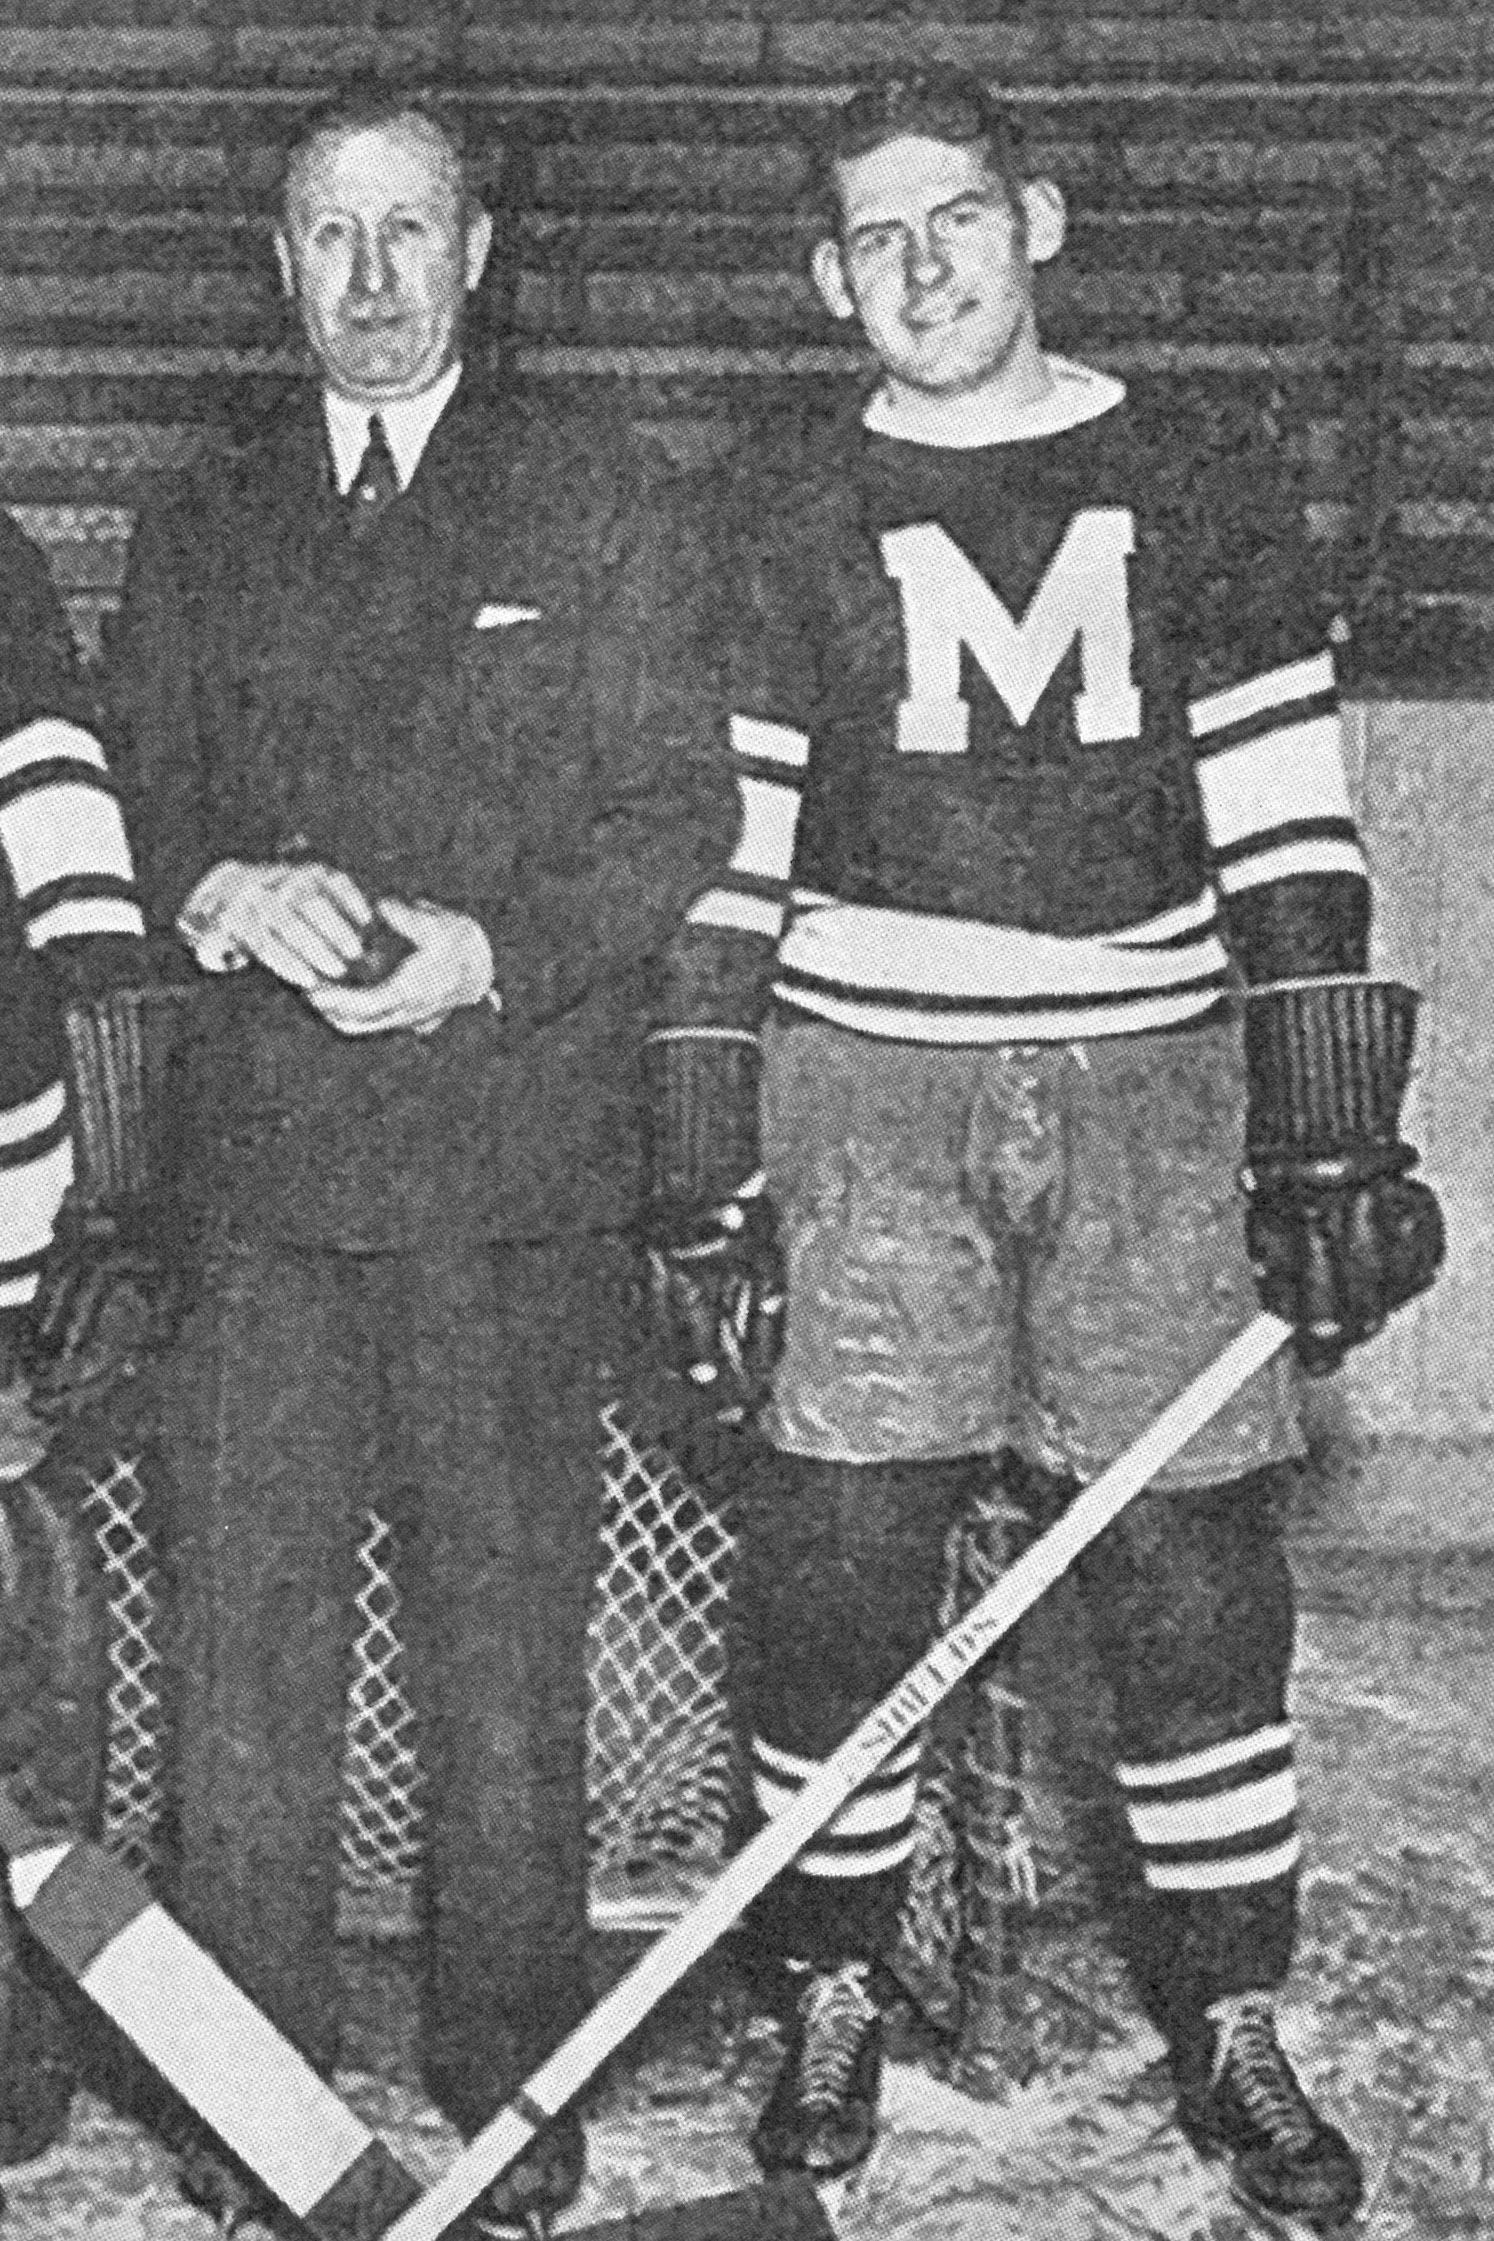 1937 Montreal Maroons season